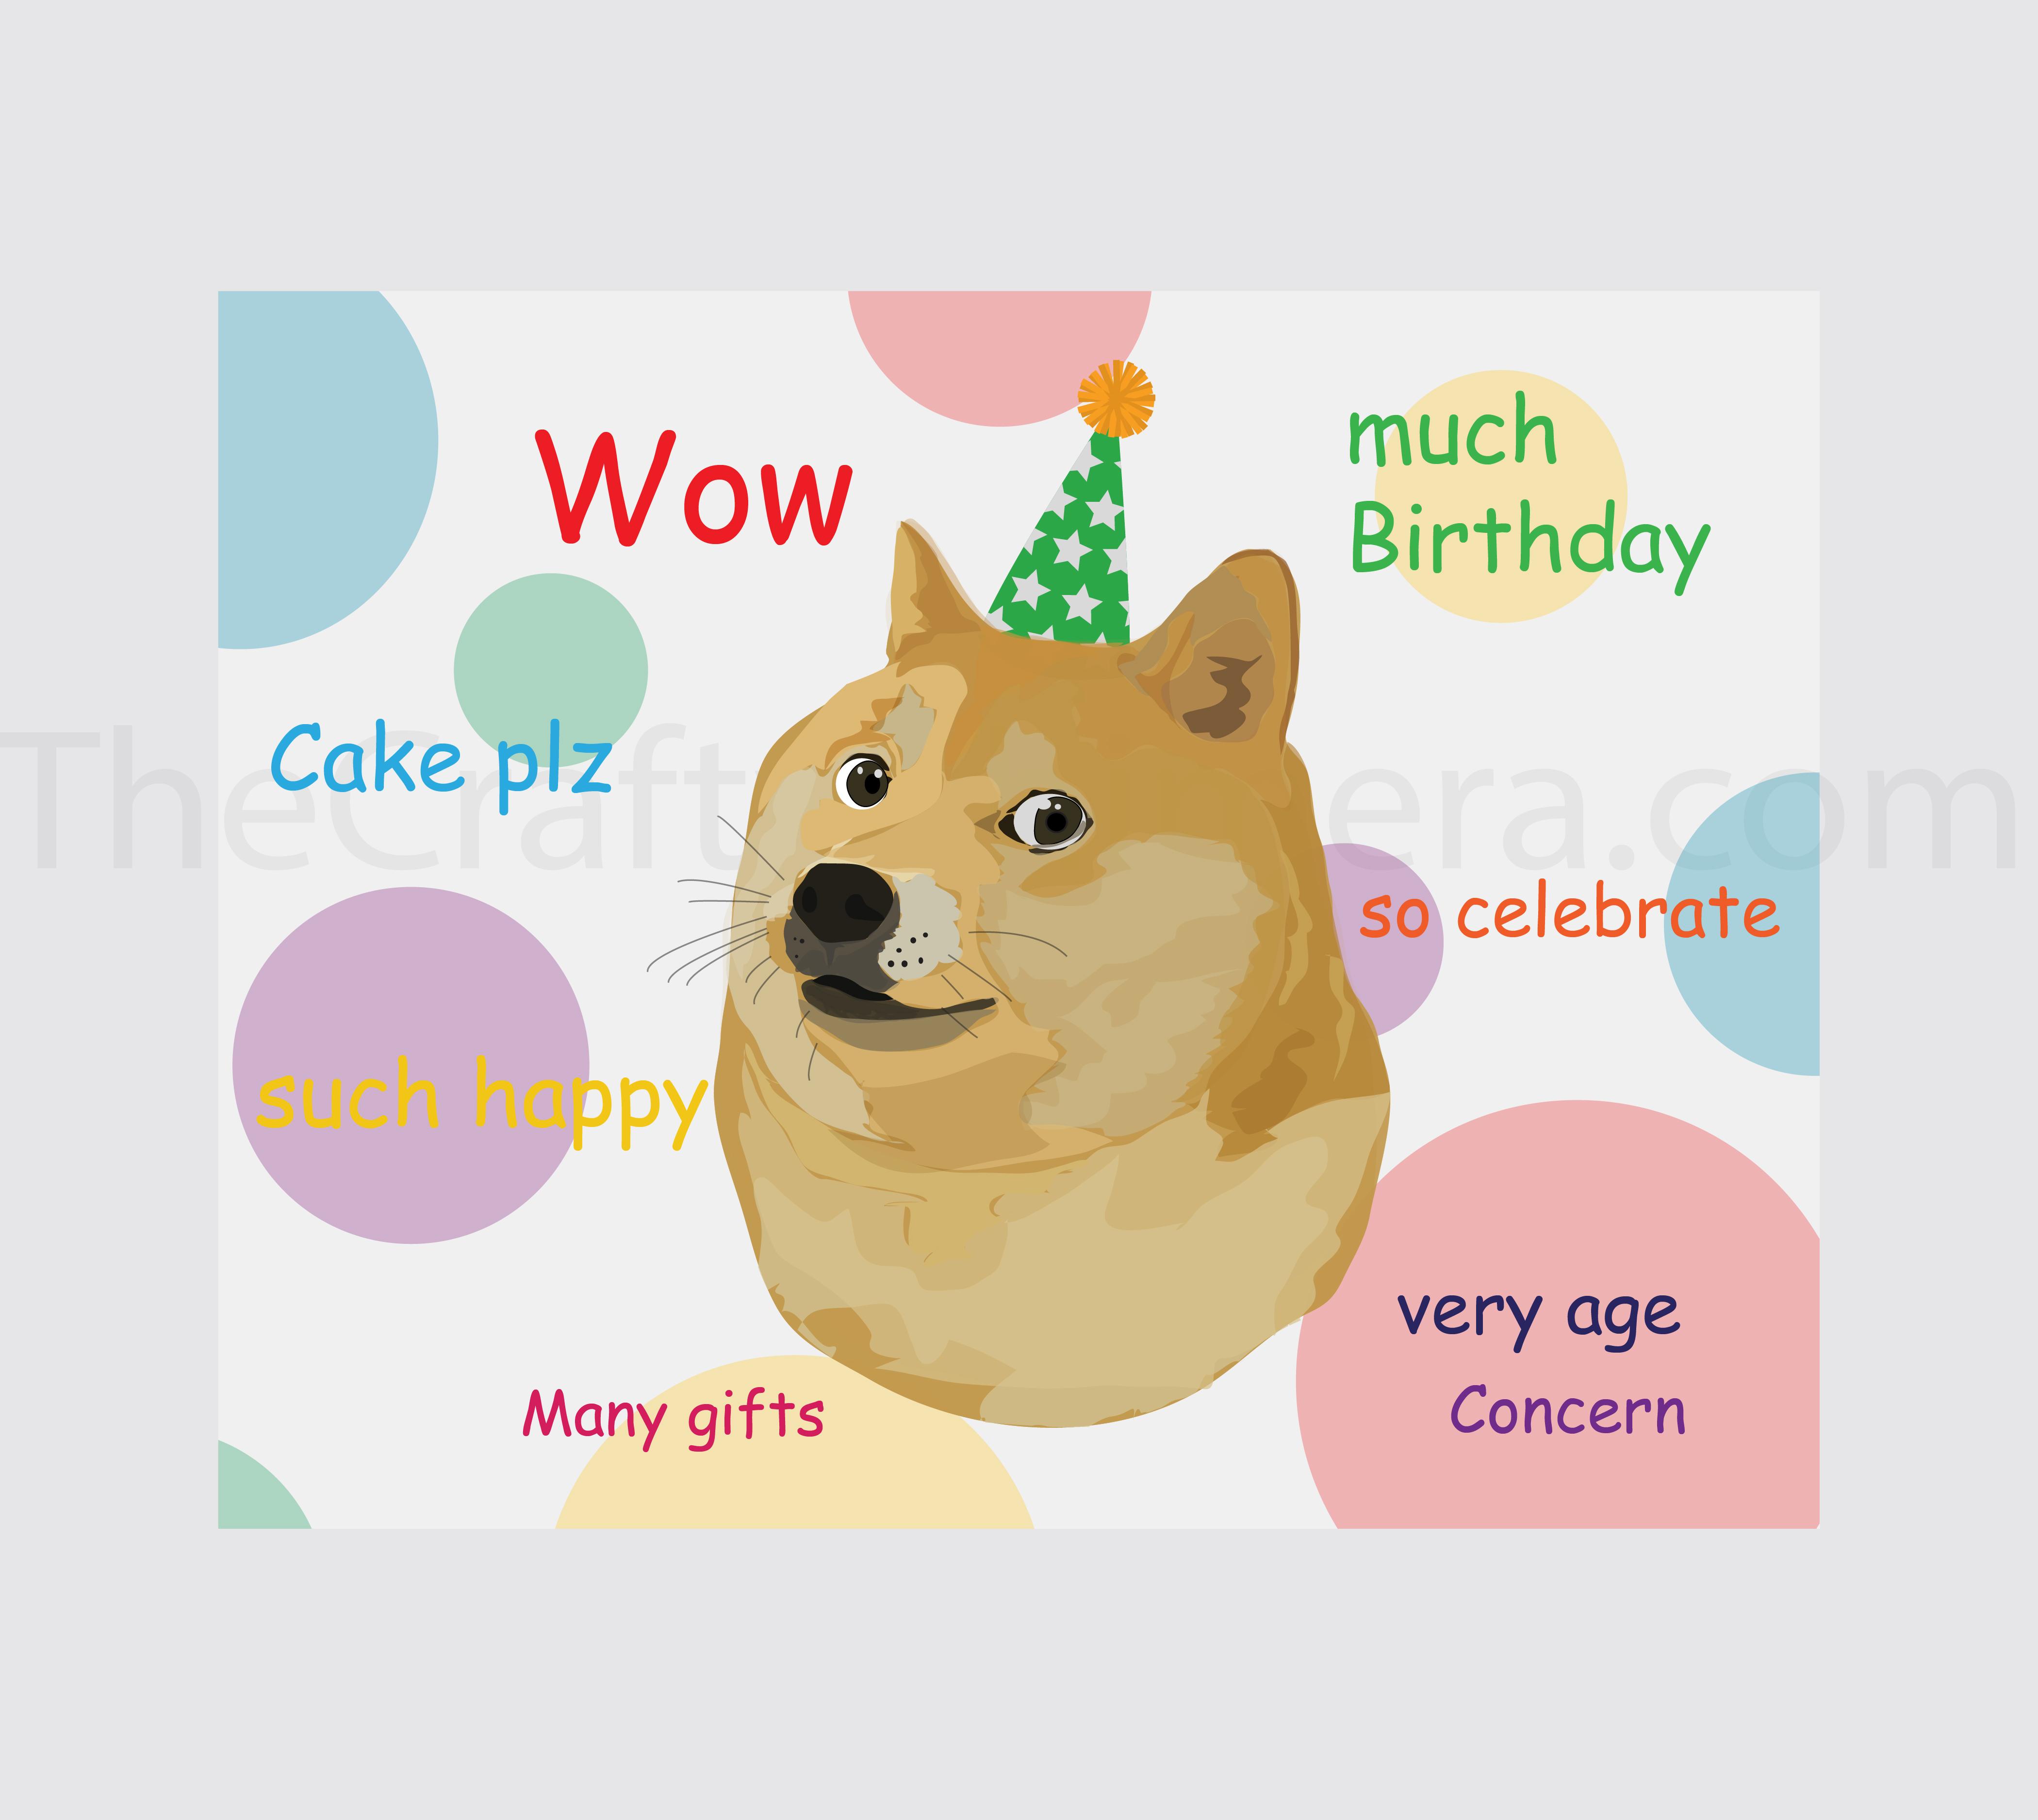 Printable birthday card by thecraftychimera on deviantart doge printable birthday card by thecraftychimera doge printable birthday card by thecraftychimera bookmarktalkfo Choice Image